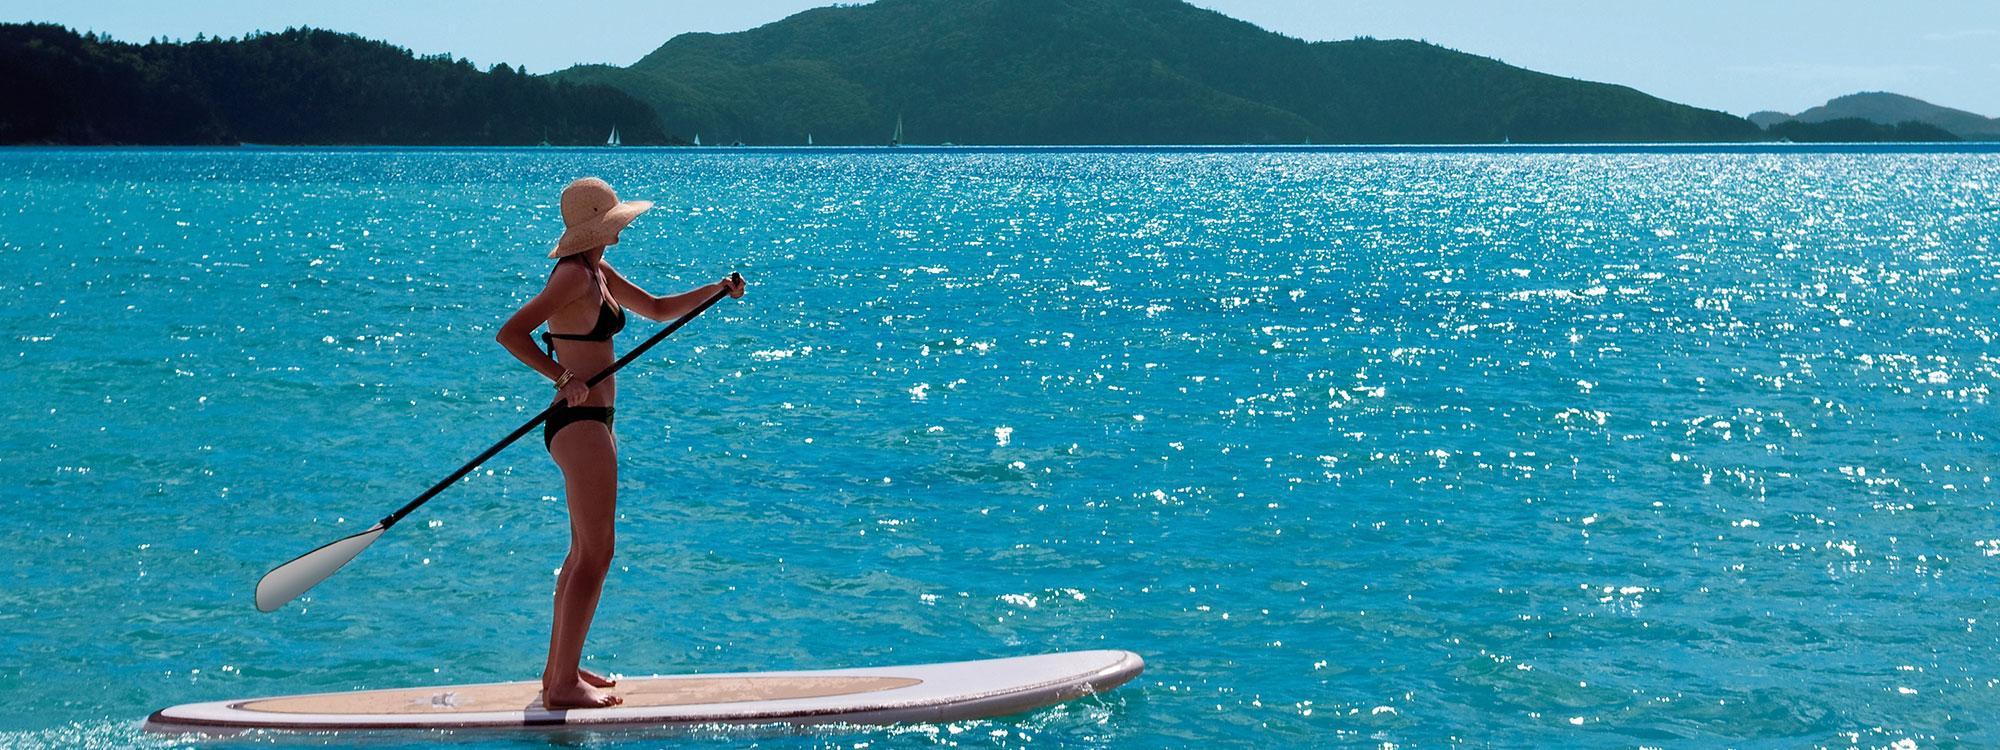 Paddle-boarding-Catseye.jpg-banner-2000